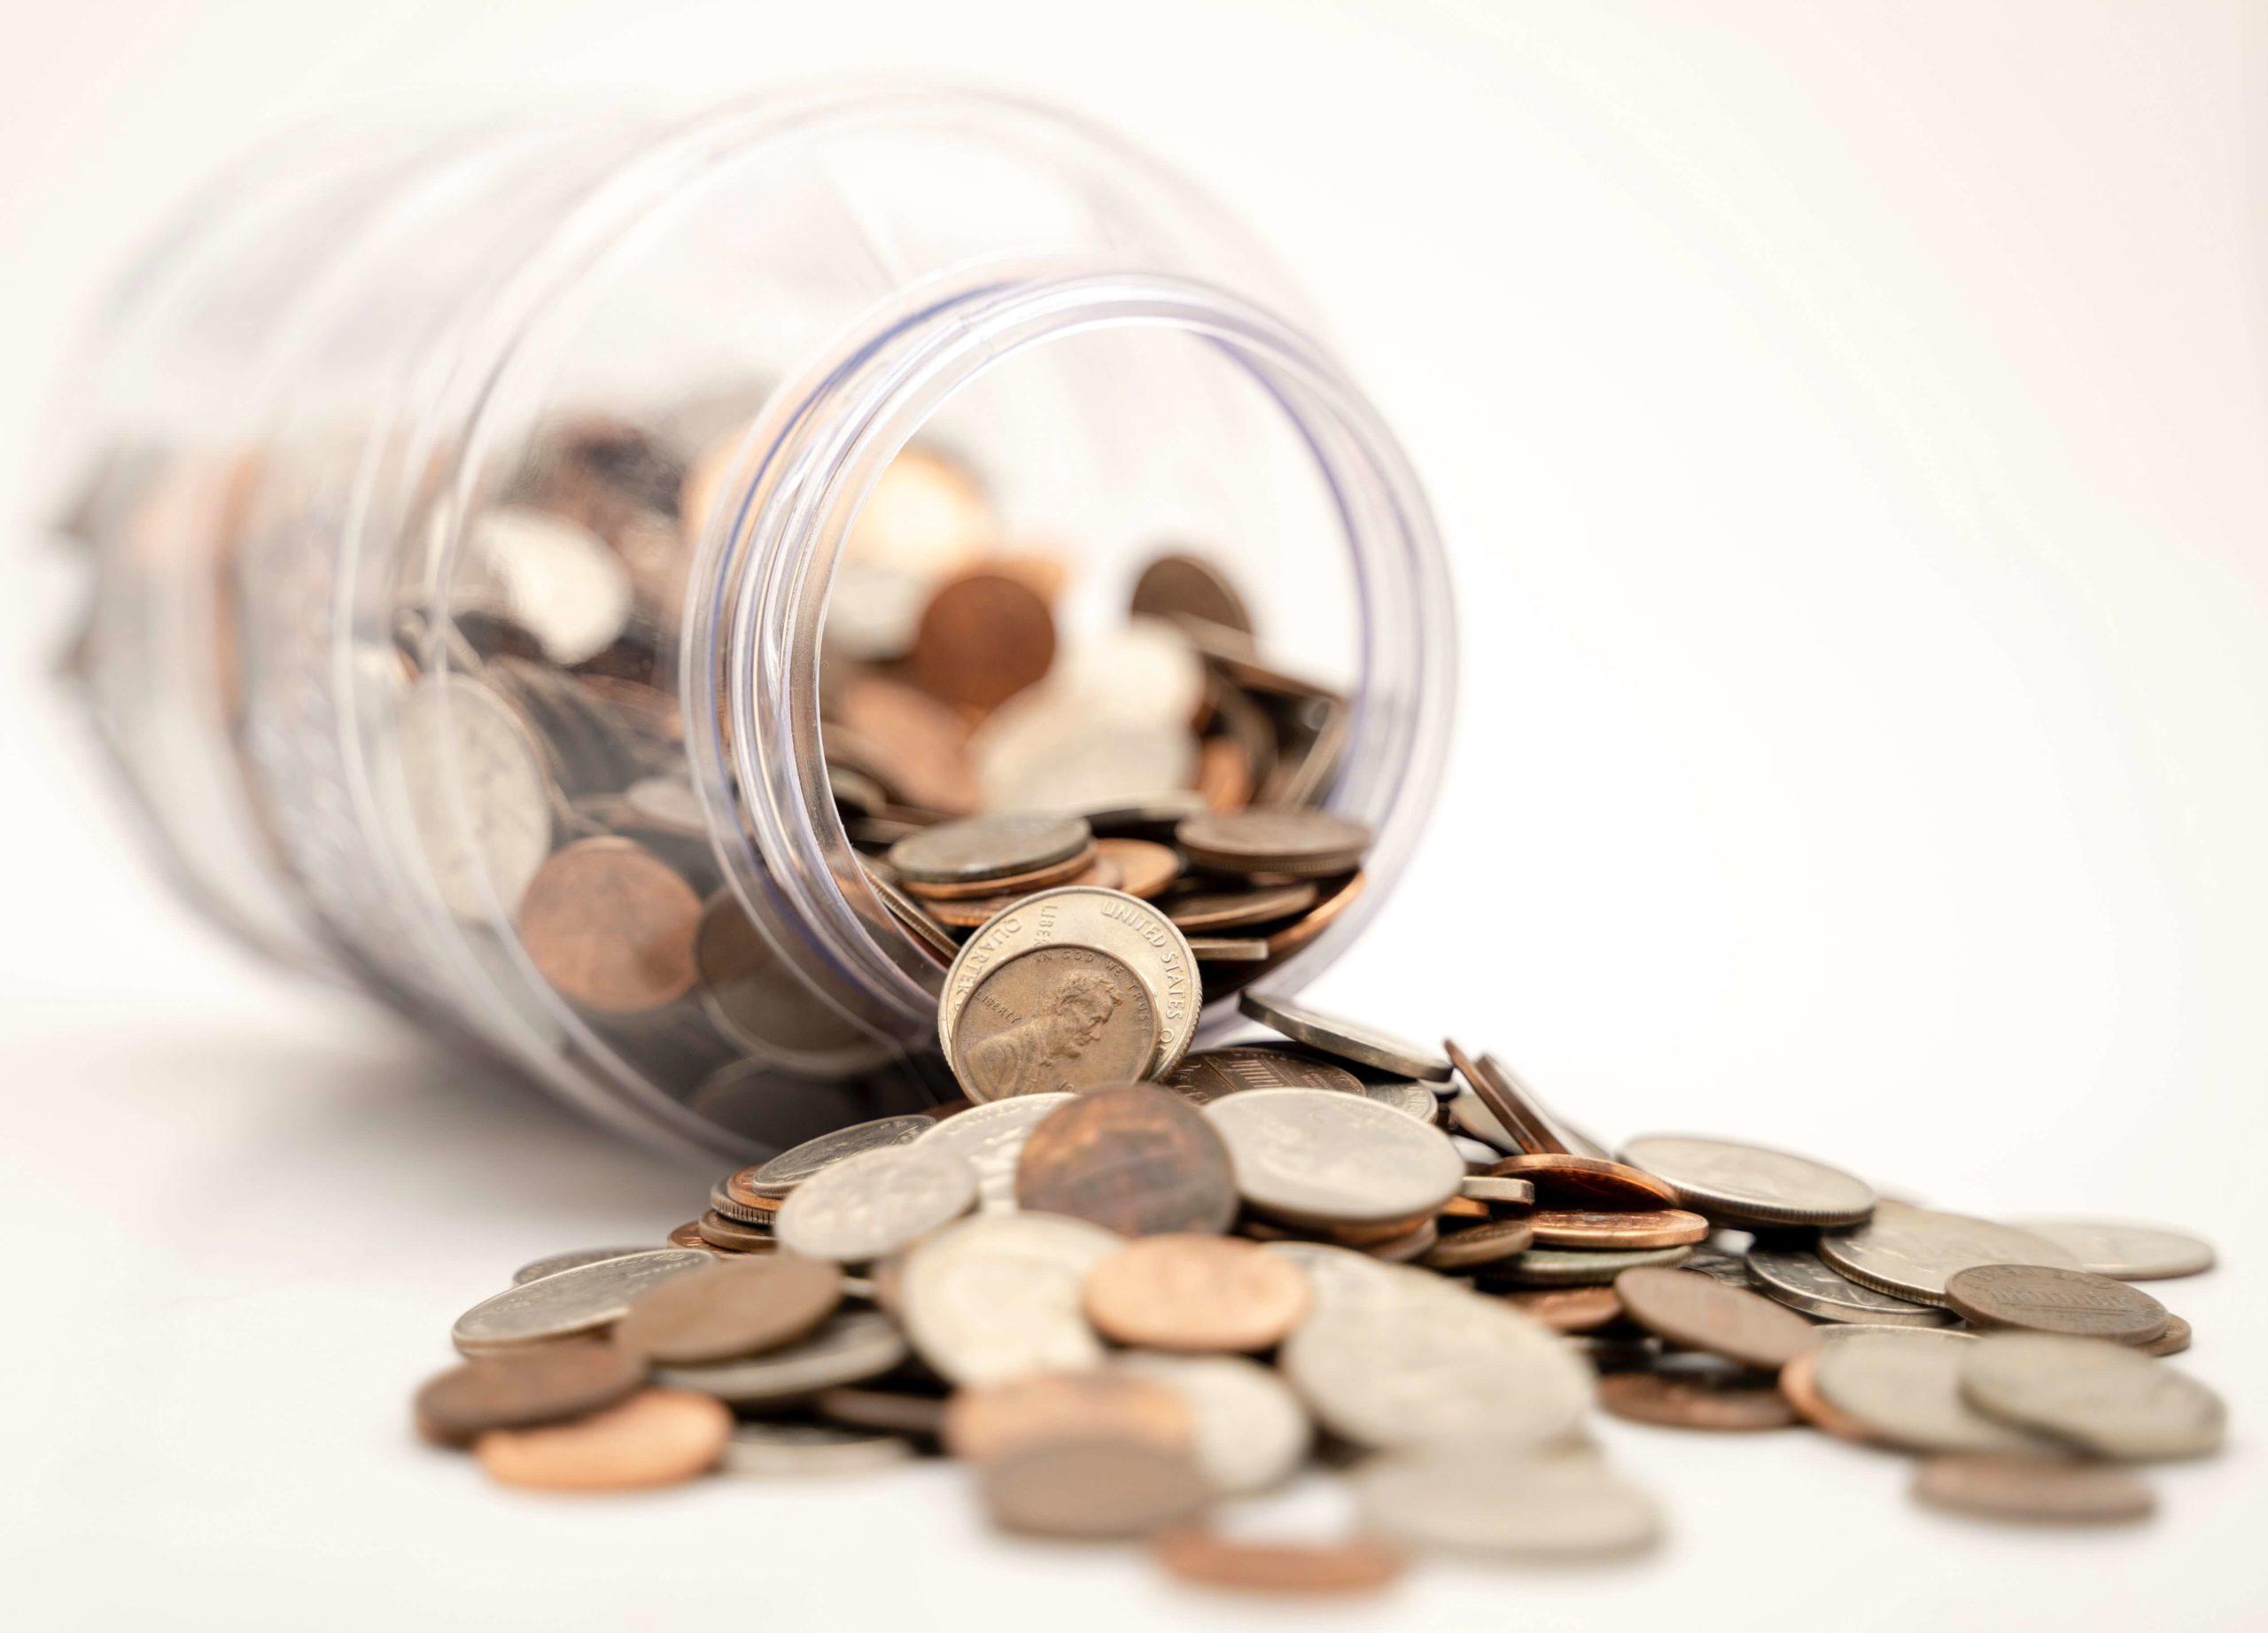 What Your Employees Sneak on Their Travel & Mileage Reimbursement Form